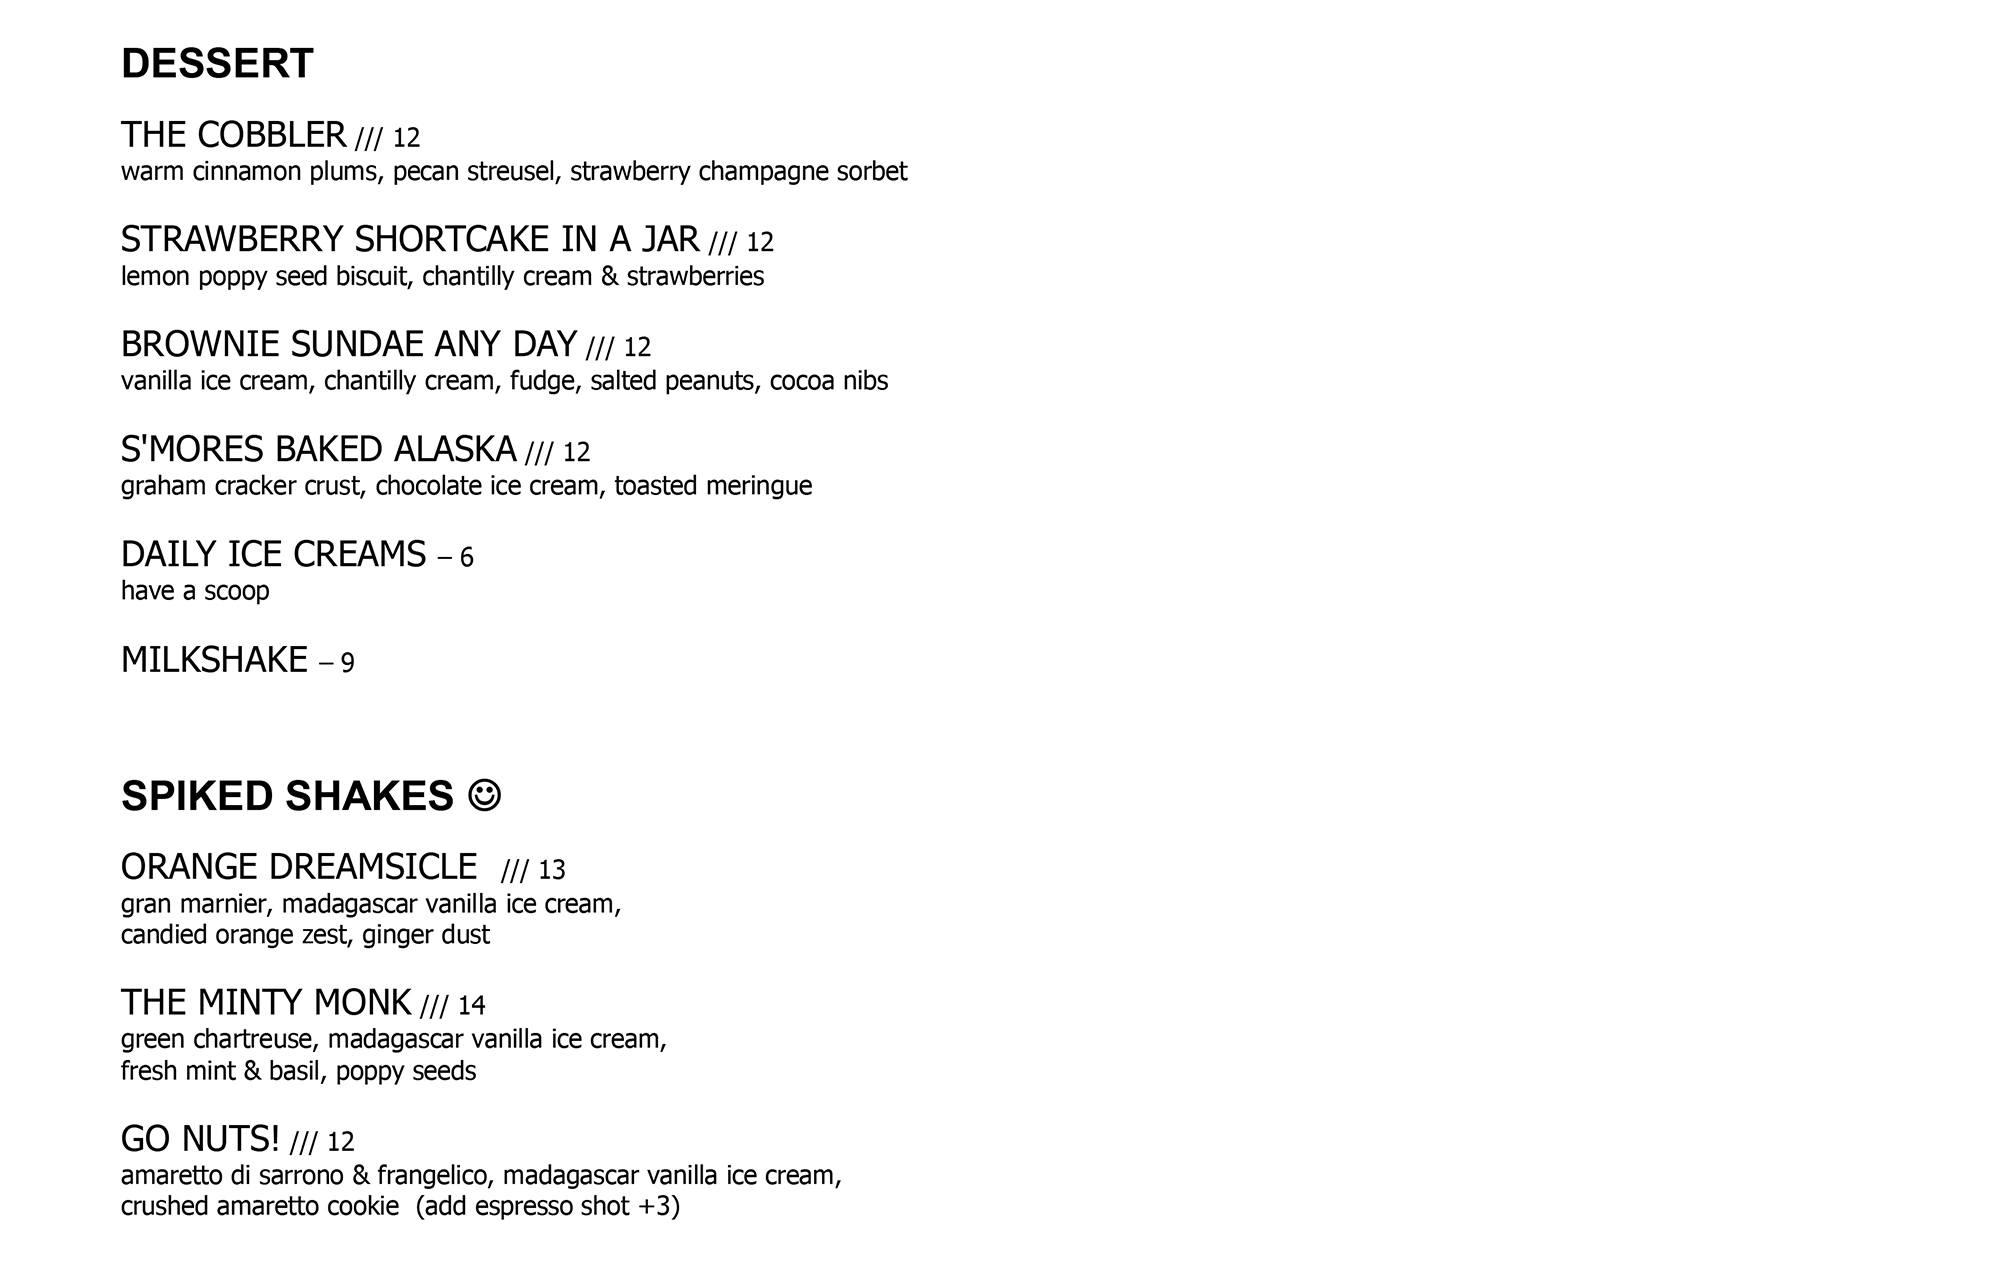 The Wellington dessert list